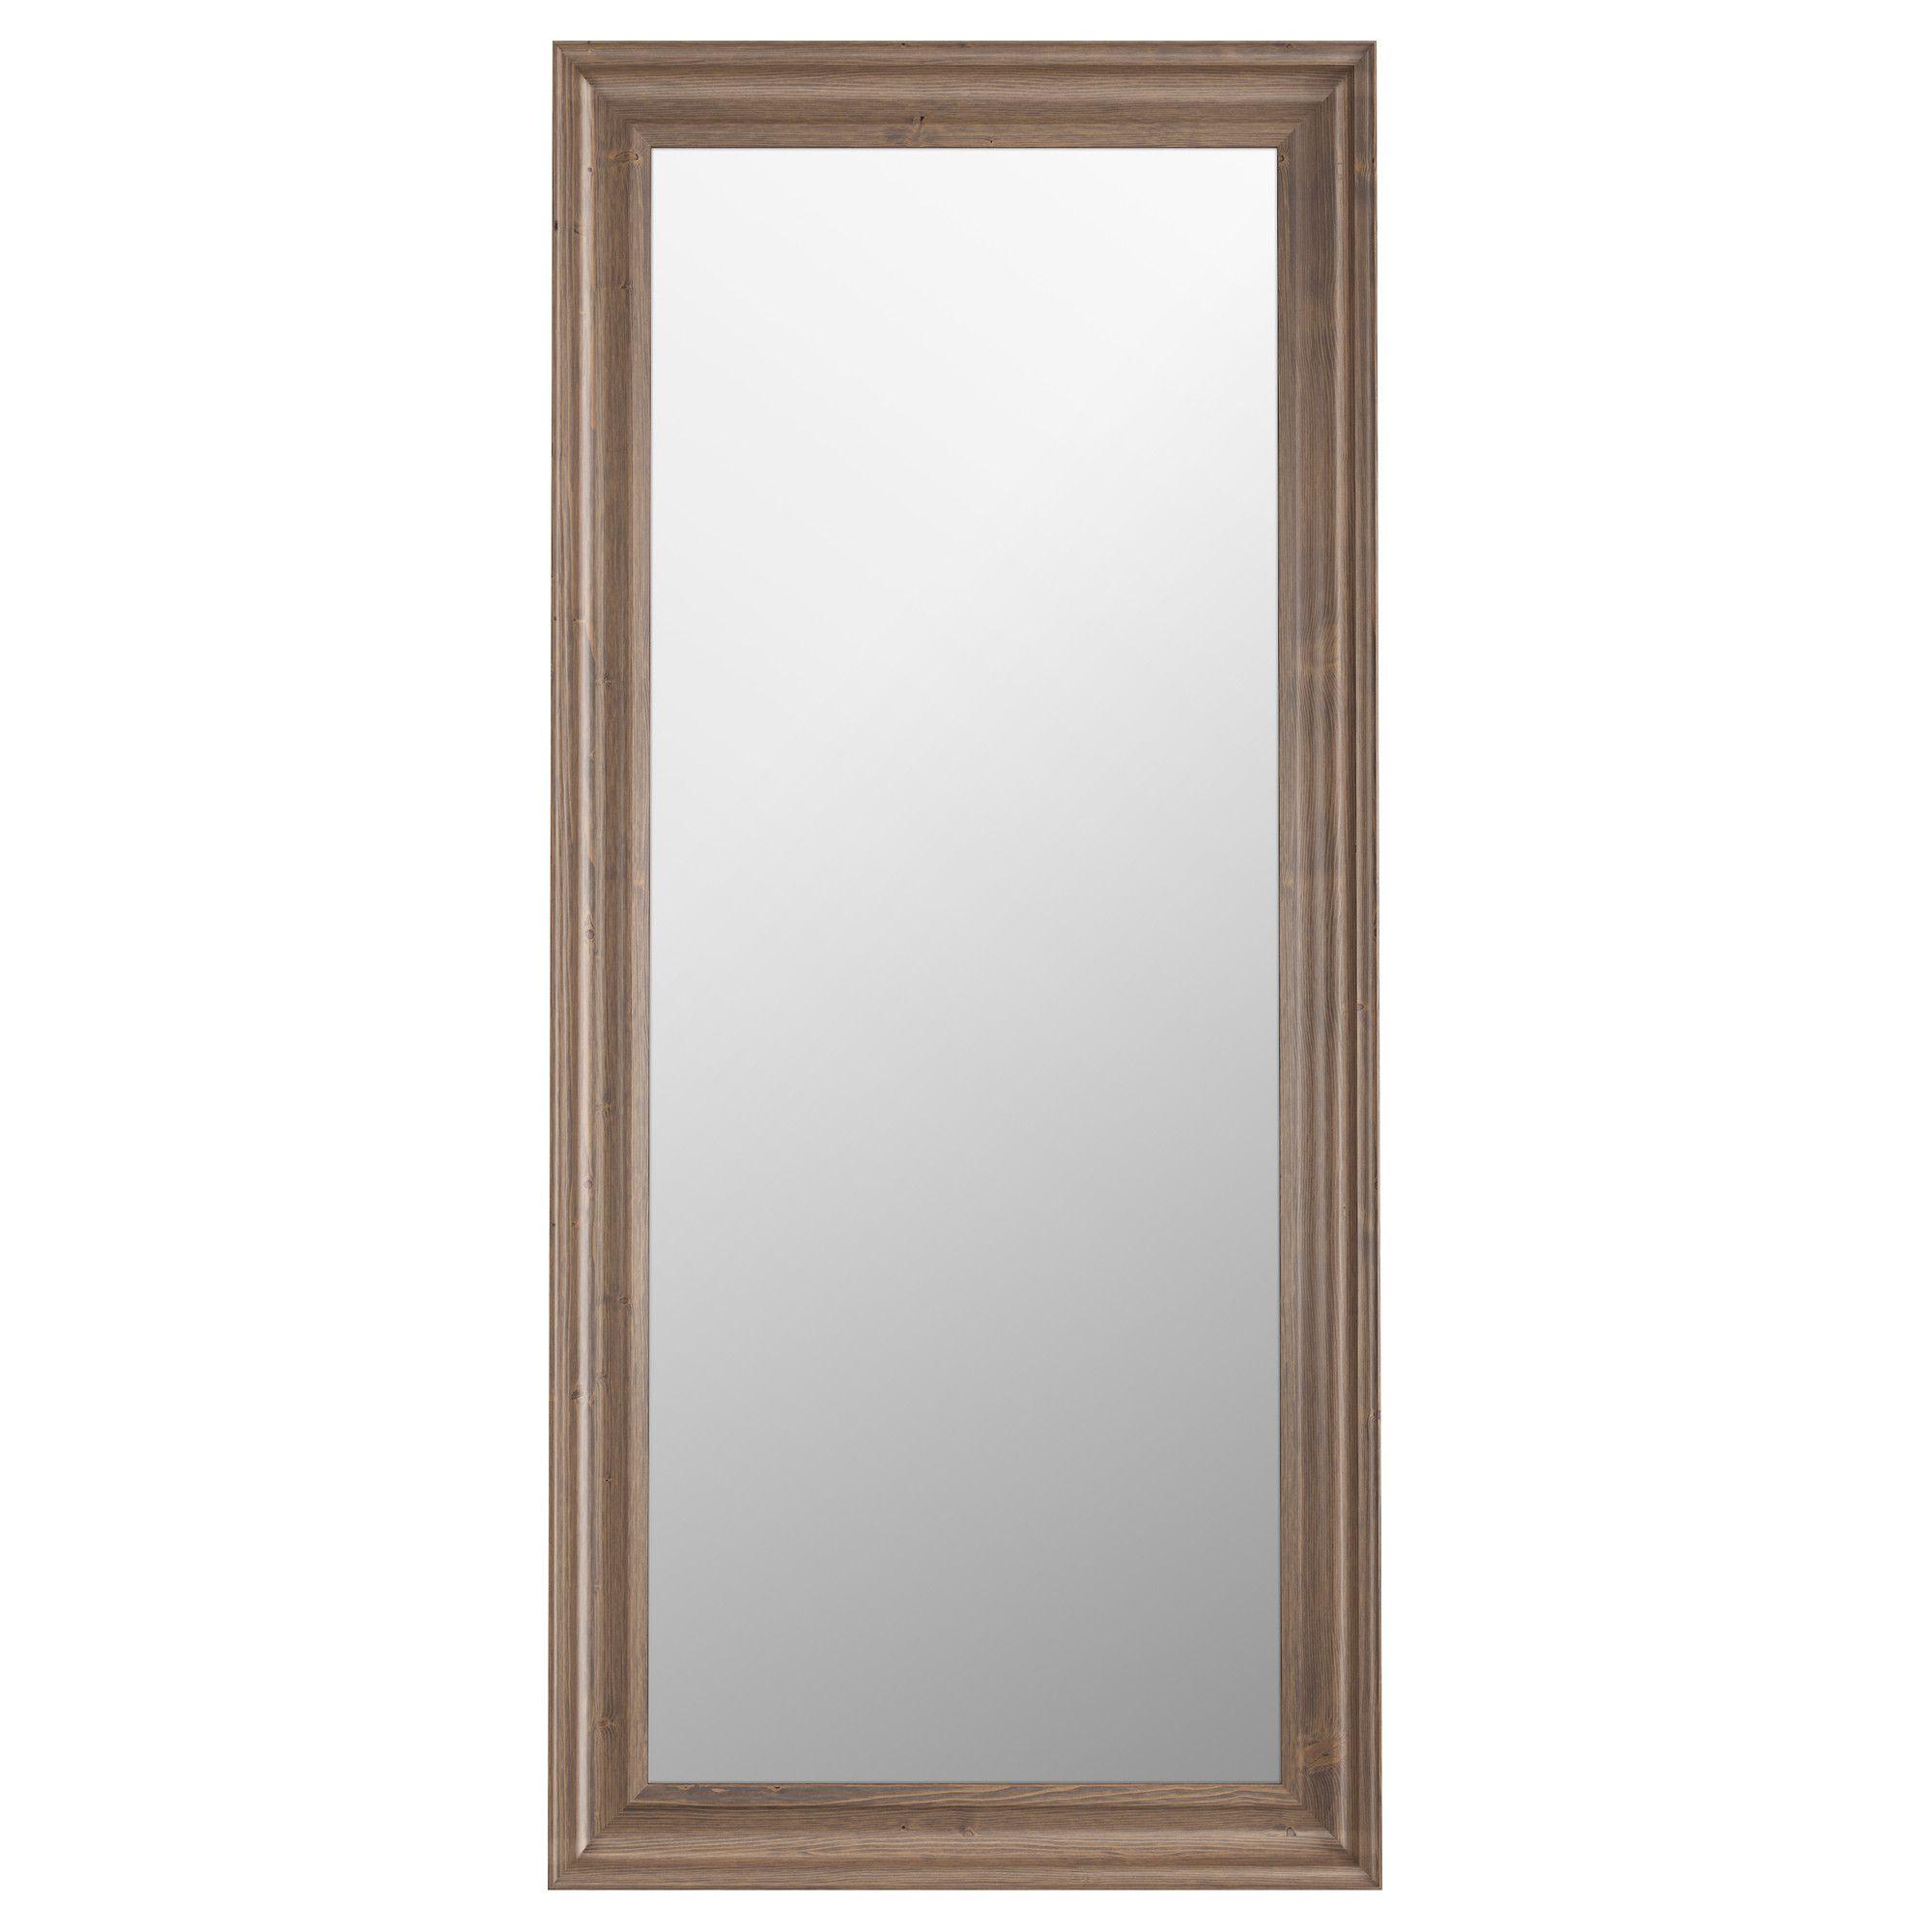 HEMNES Mirror   Gray Brown   IKEA, $44.99   To Be Hung Between Bath And  Closet Doors At Eye Level | 11 Overlook Ridge | Hemnes, Ikea Mirror, Ikea  Hemnes ...